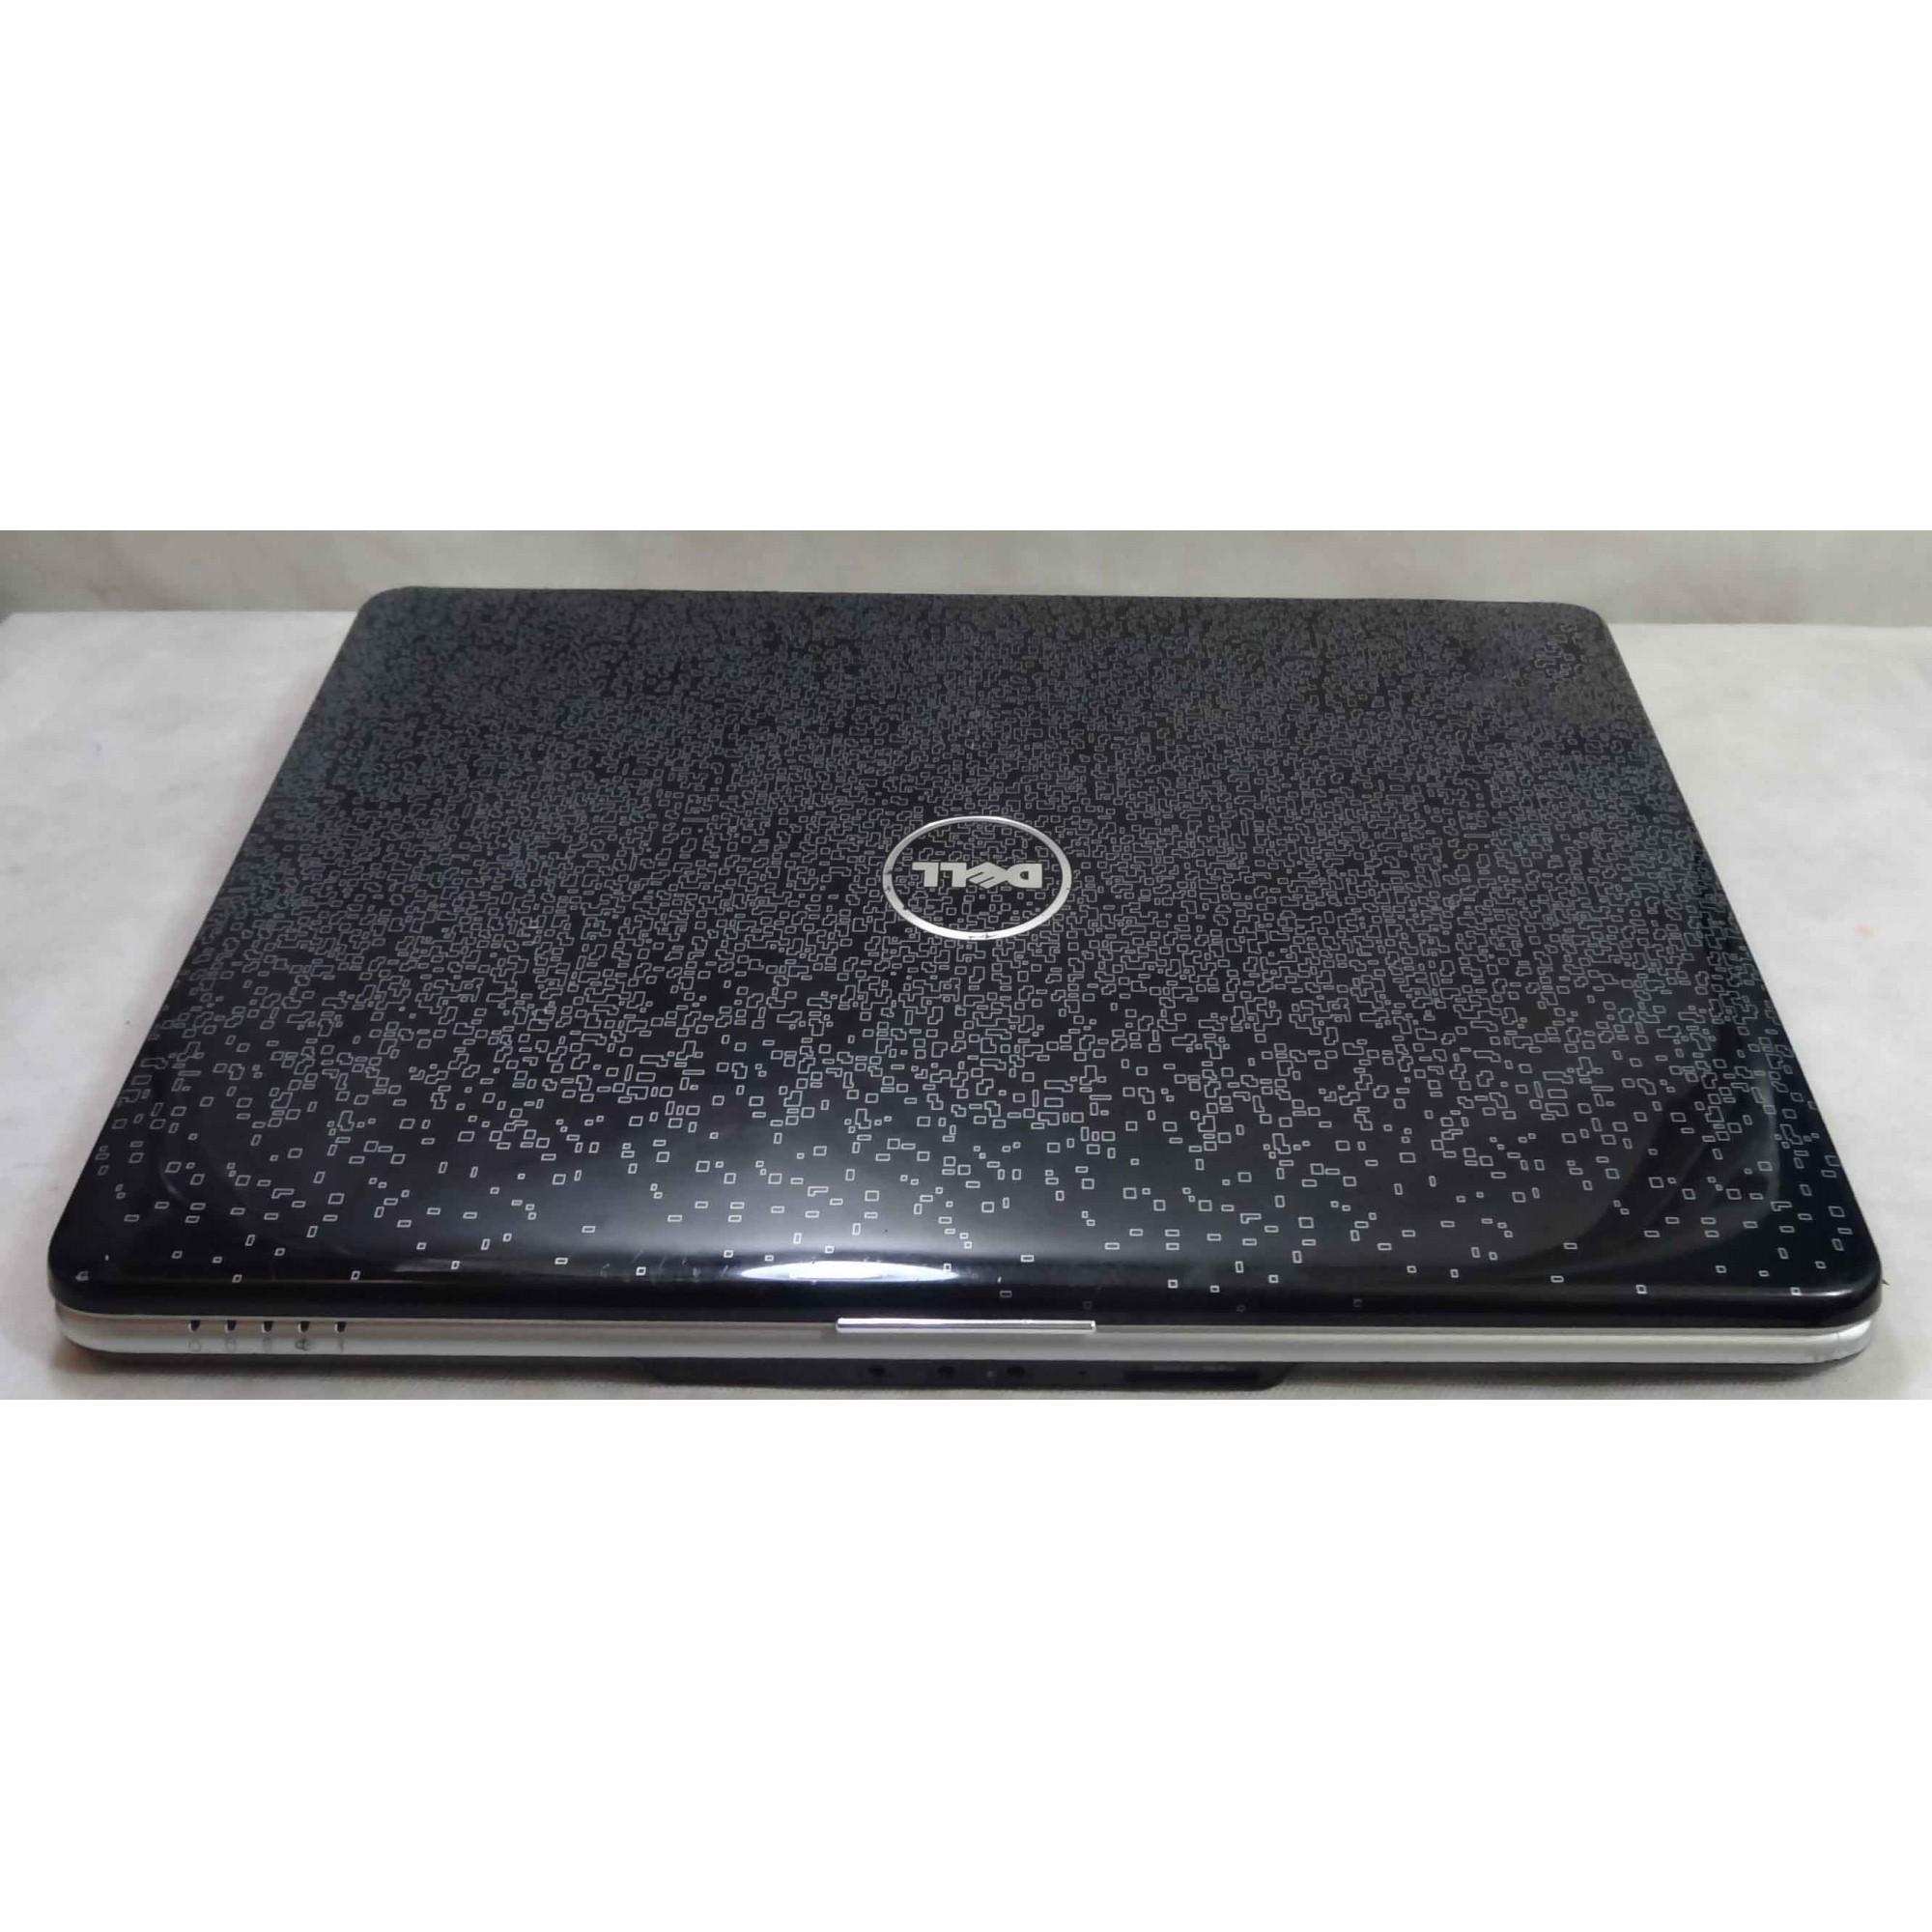 Notebook Dell Inspiron 1525 14'' Intel Celeron 2GHz 3GB HD-120GB